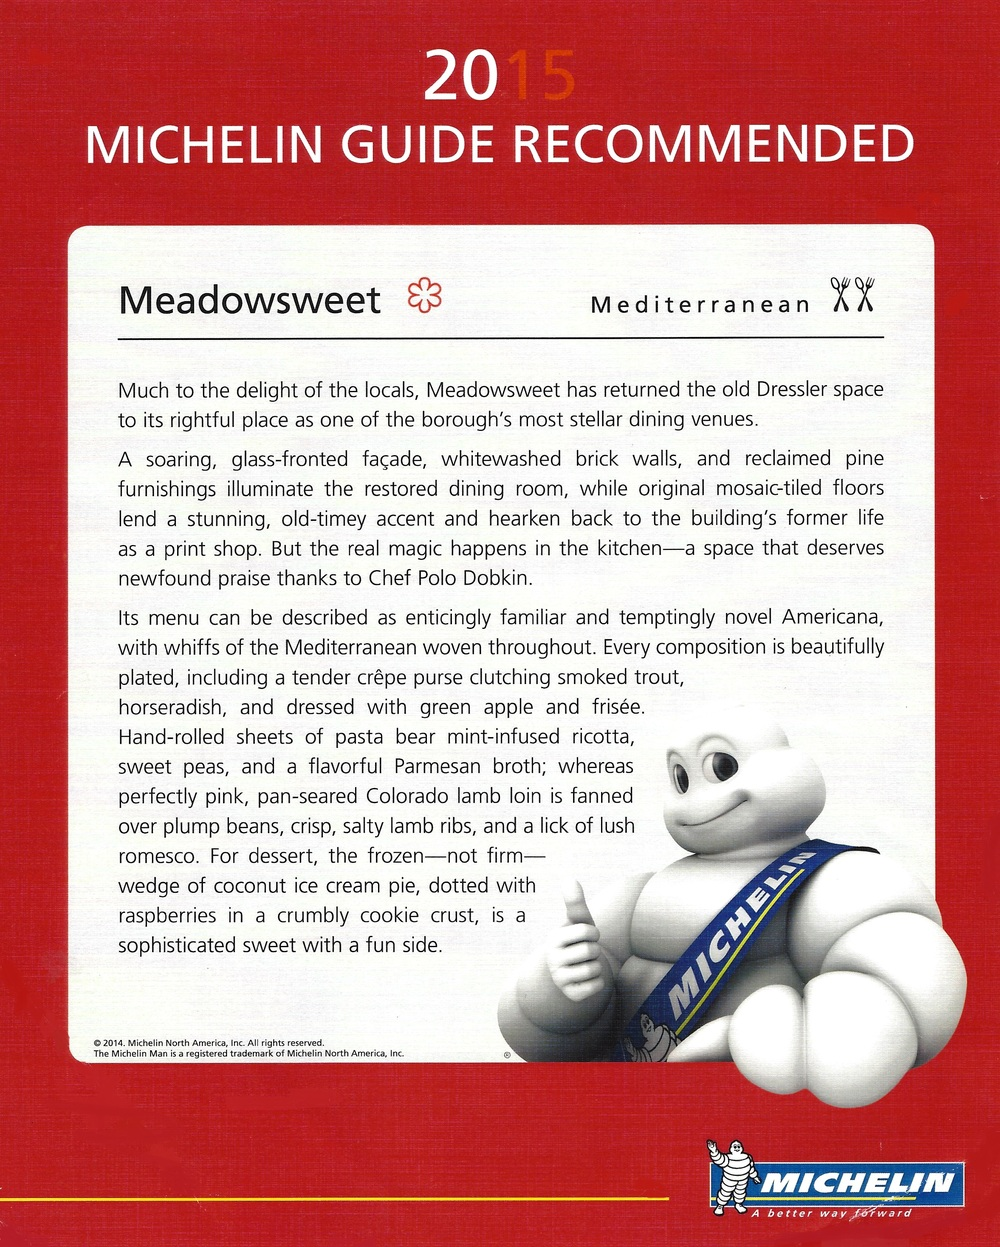 Michelin2015.jpg